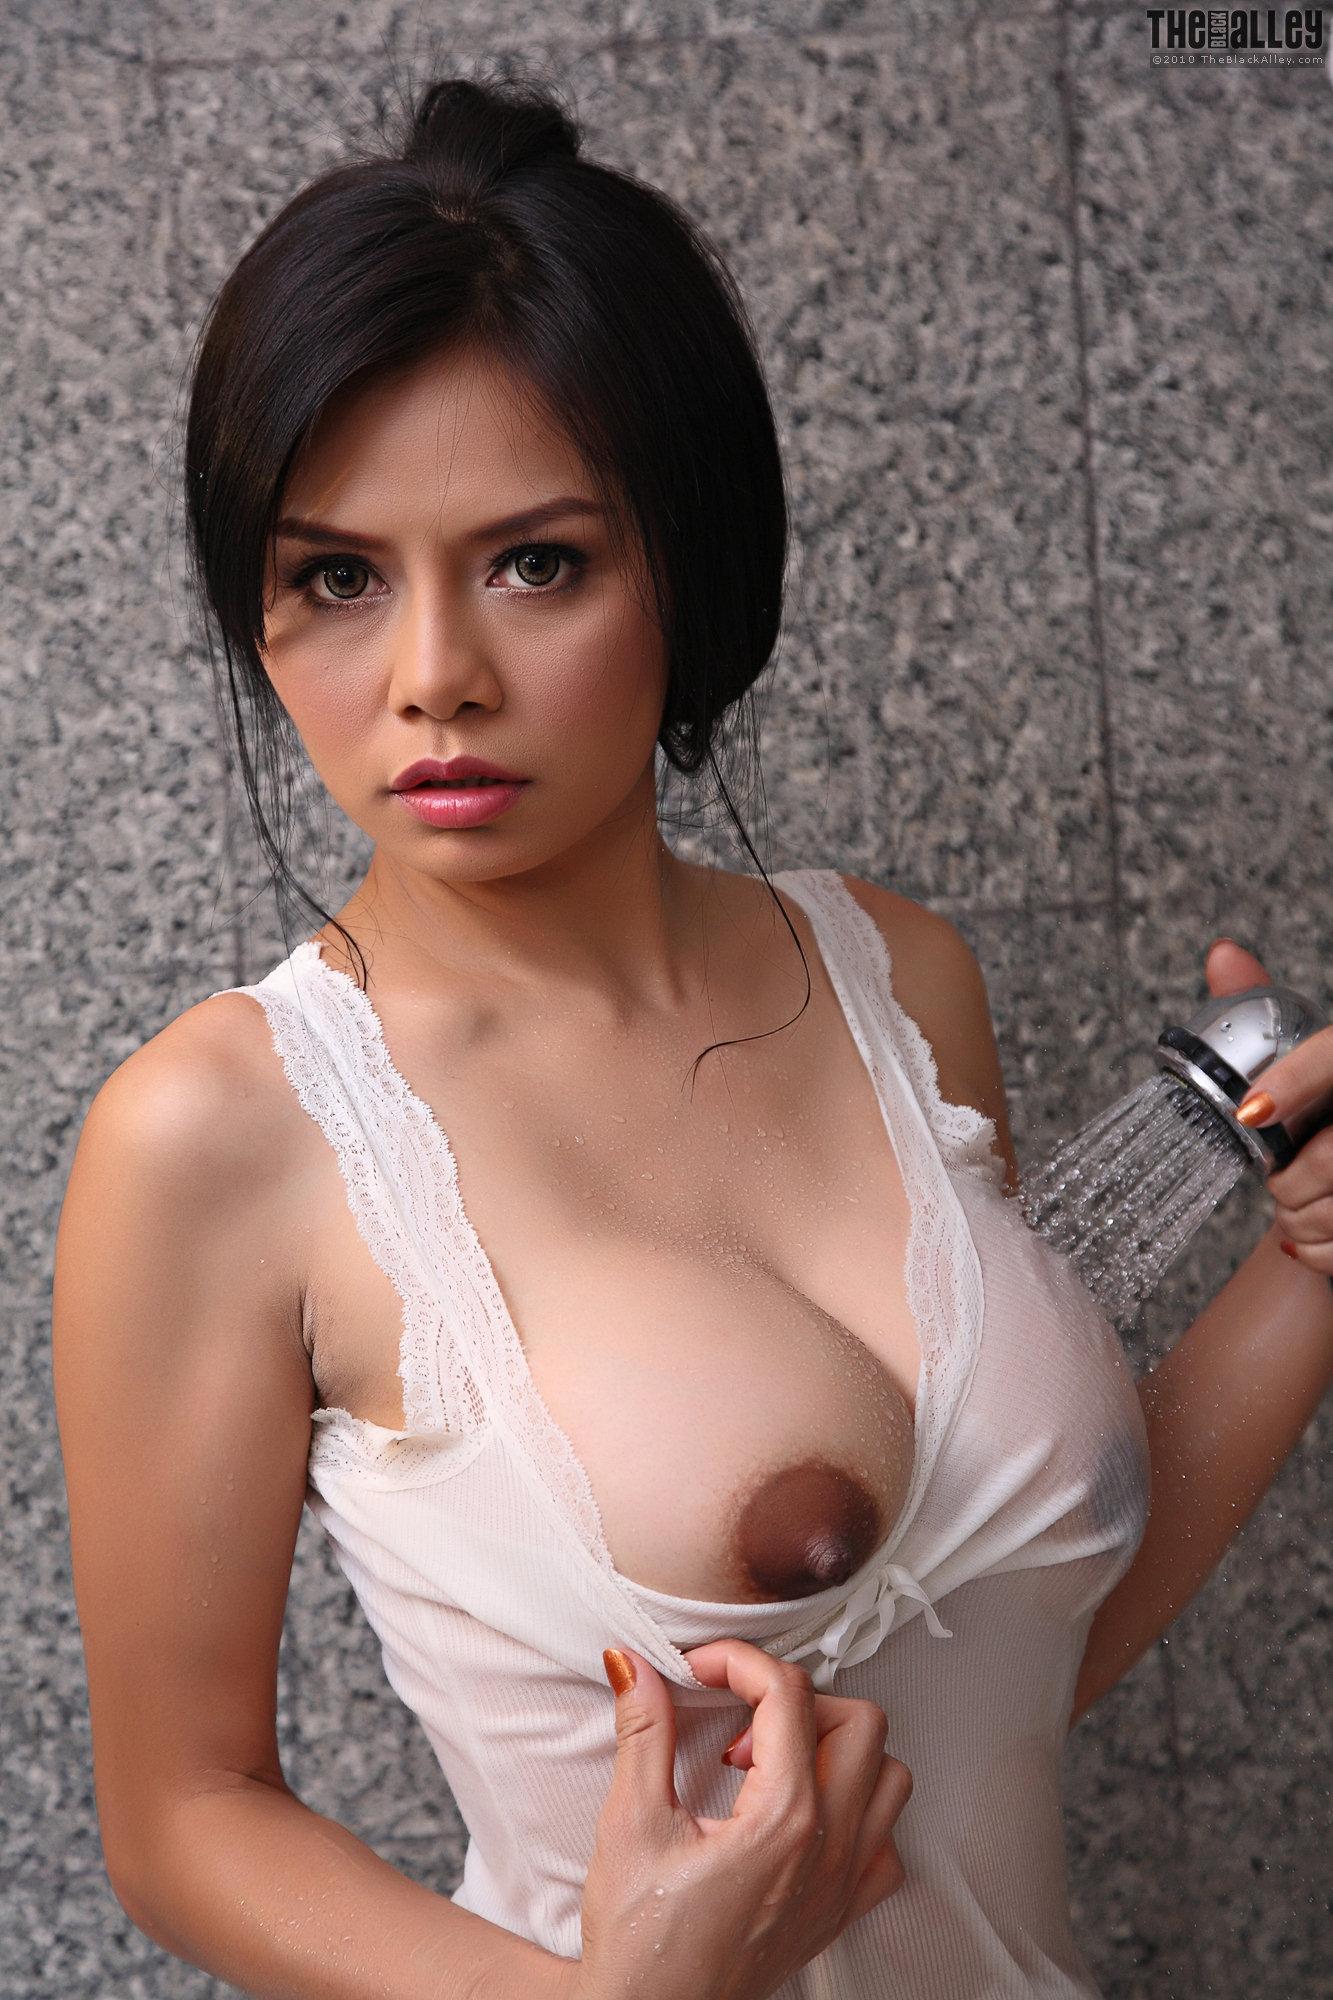 Favourite aletta boob profile shirt that oiled piece